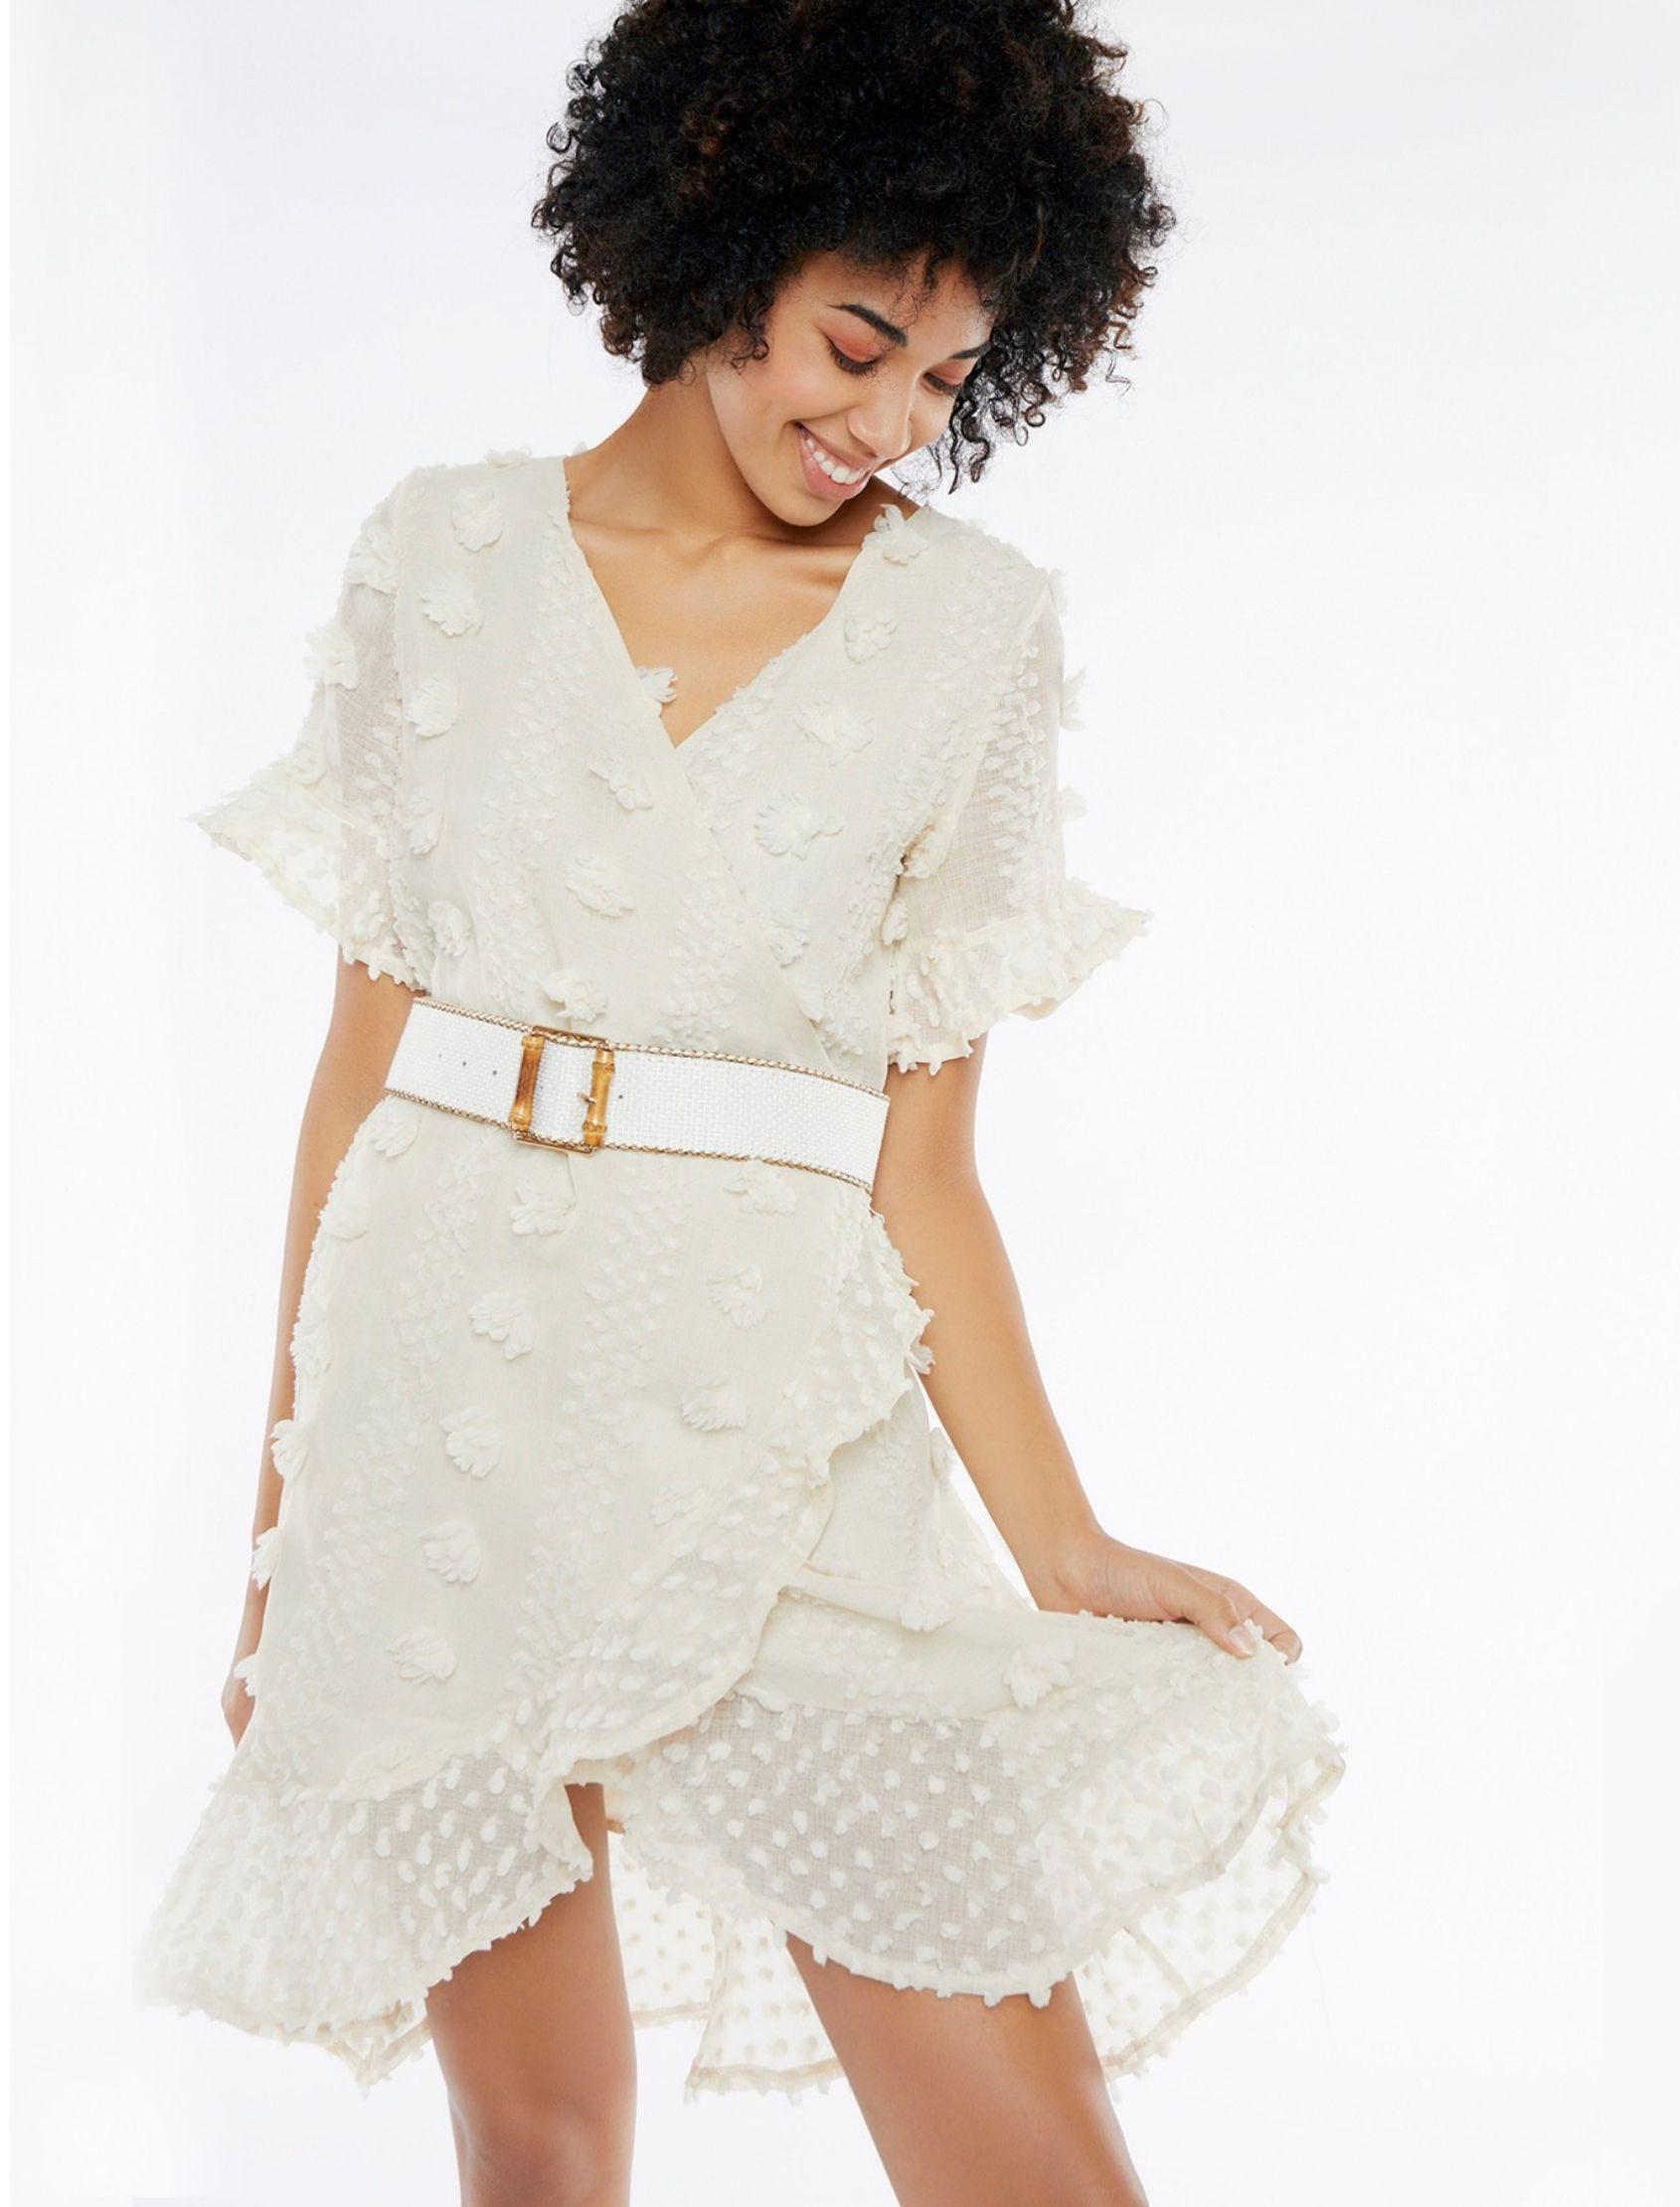 modelo con mini vestido cruzado organza en tono beige de meisïe